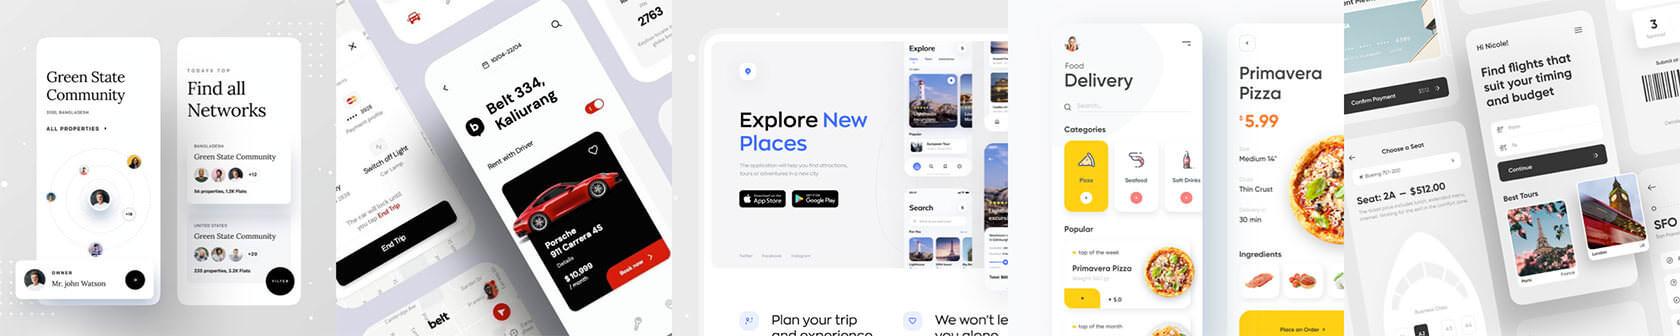 minimal-webdesign-guide-4